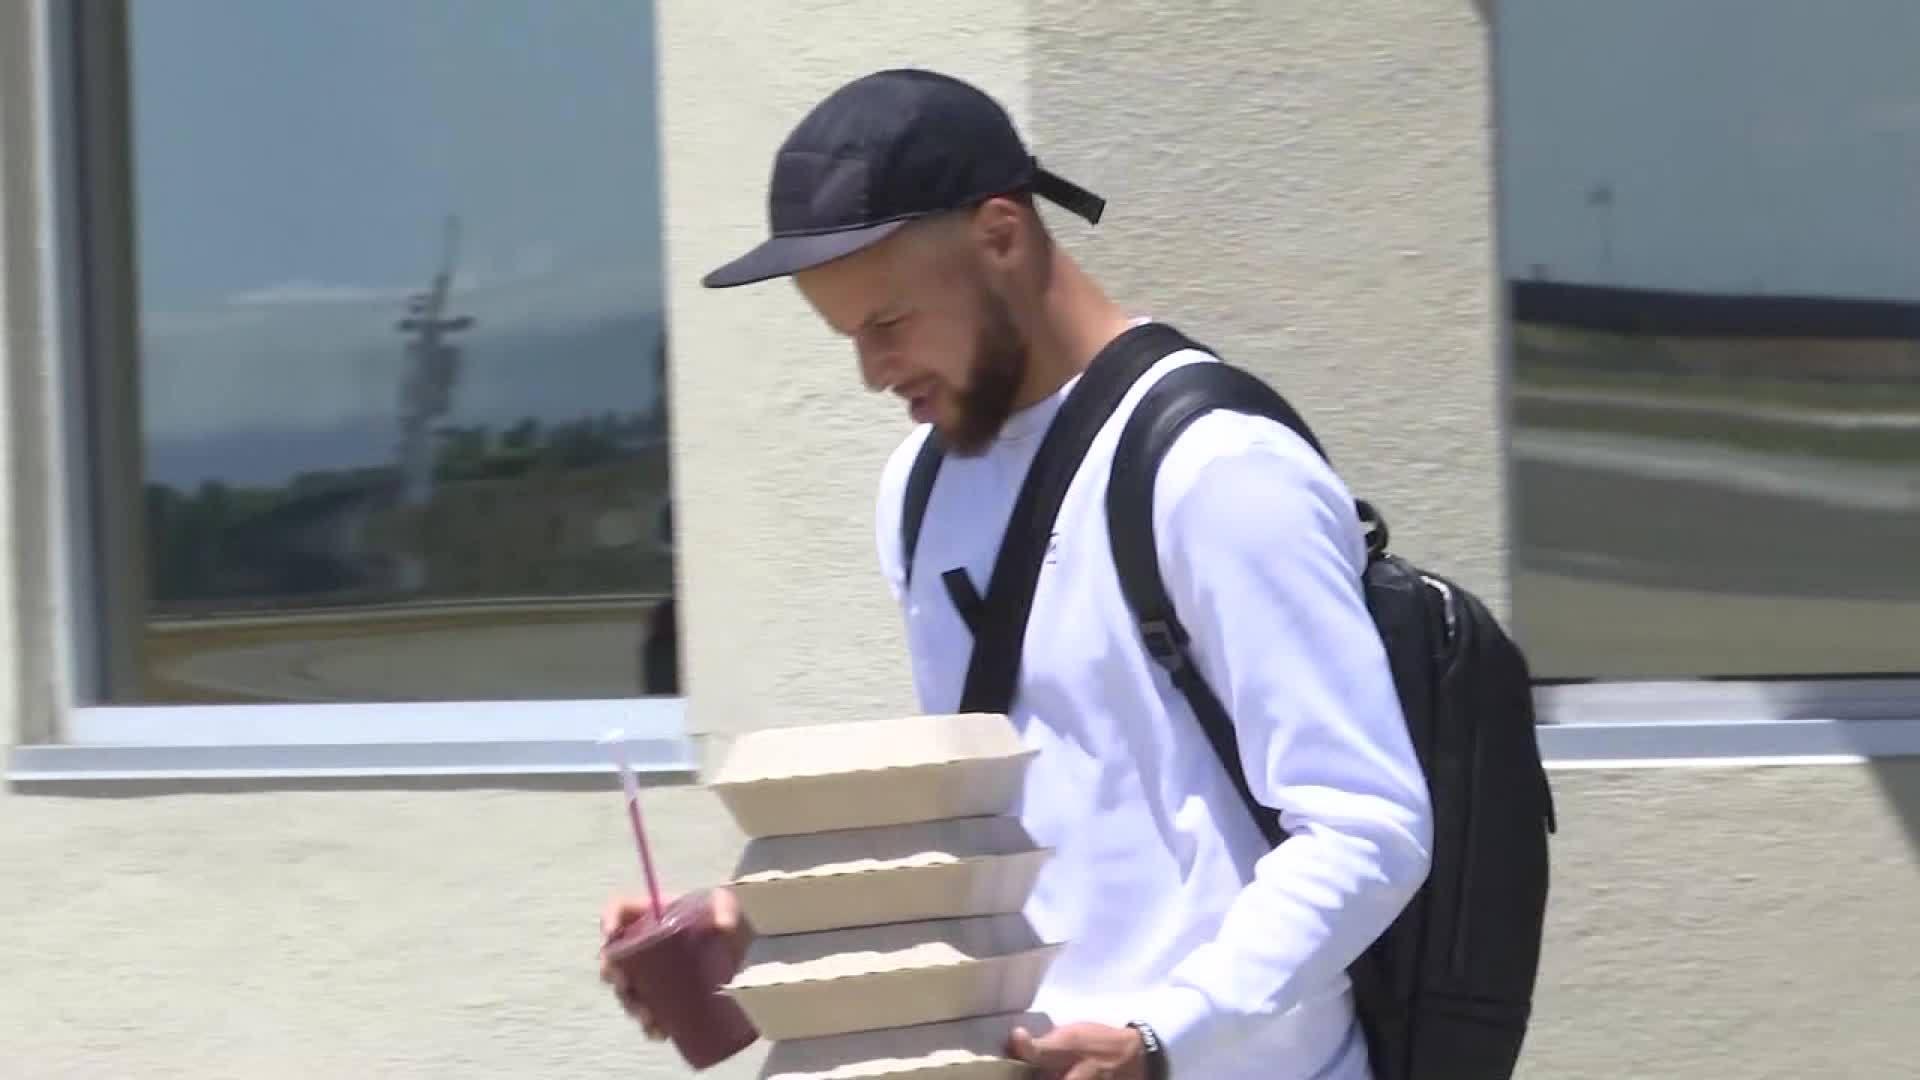 Steph Curry boards Toronto-bound plane